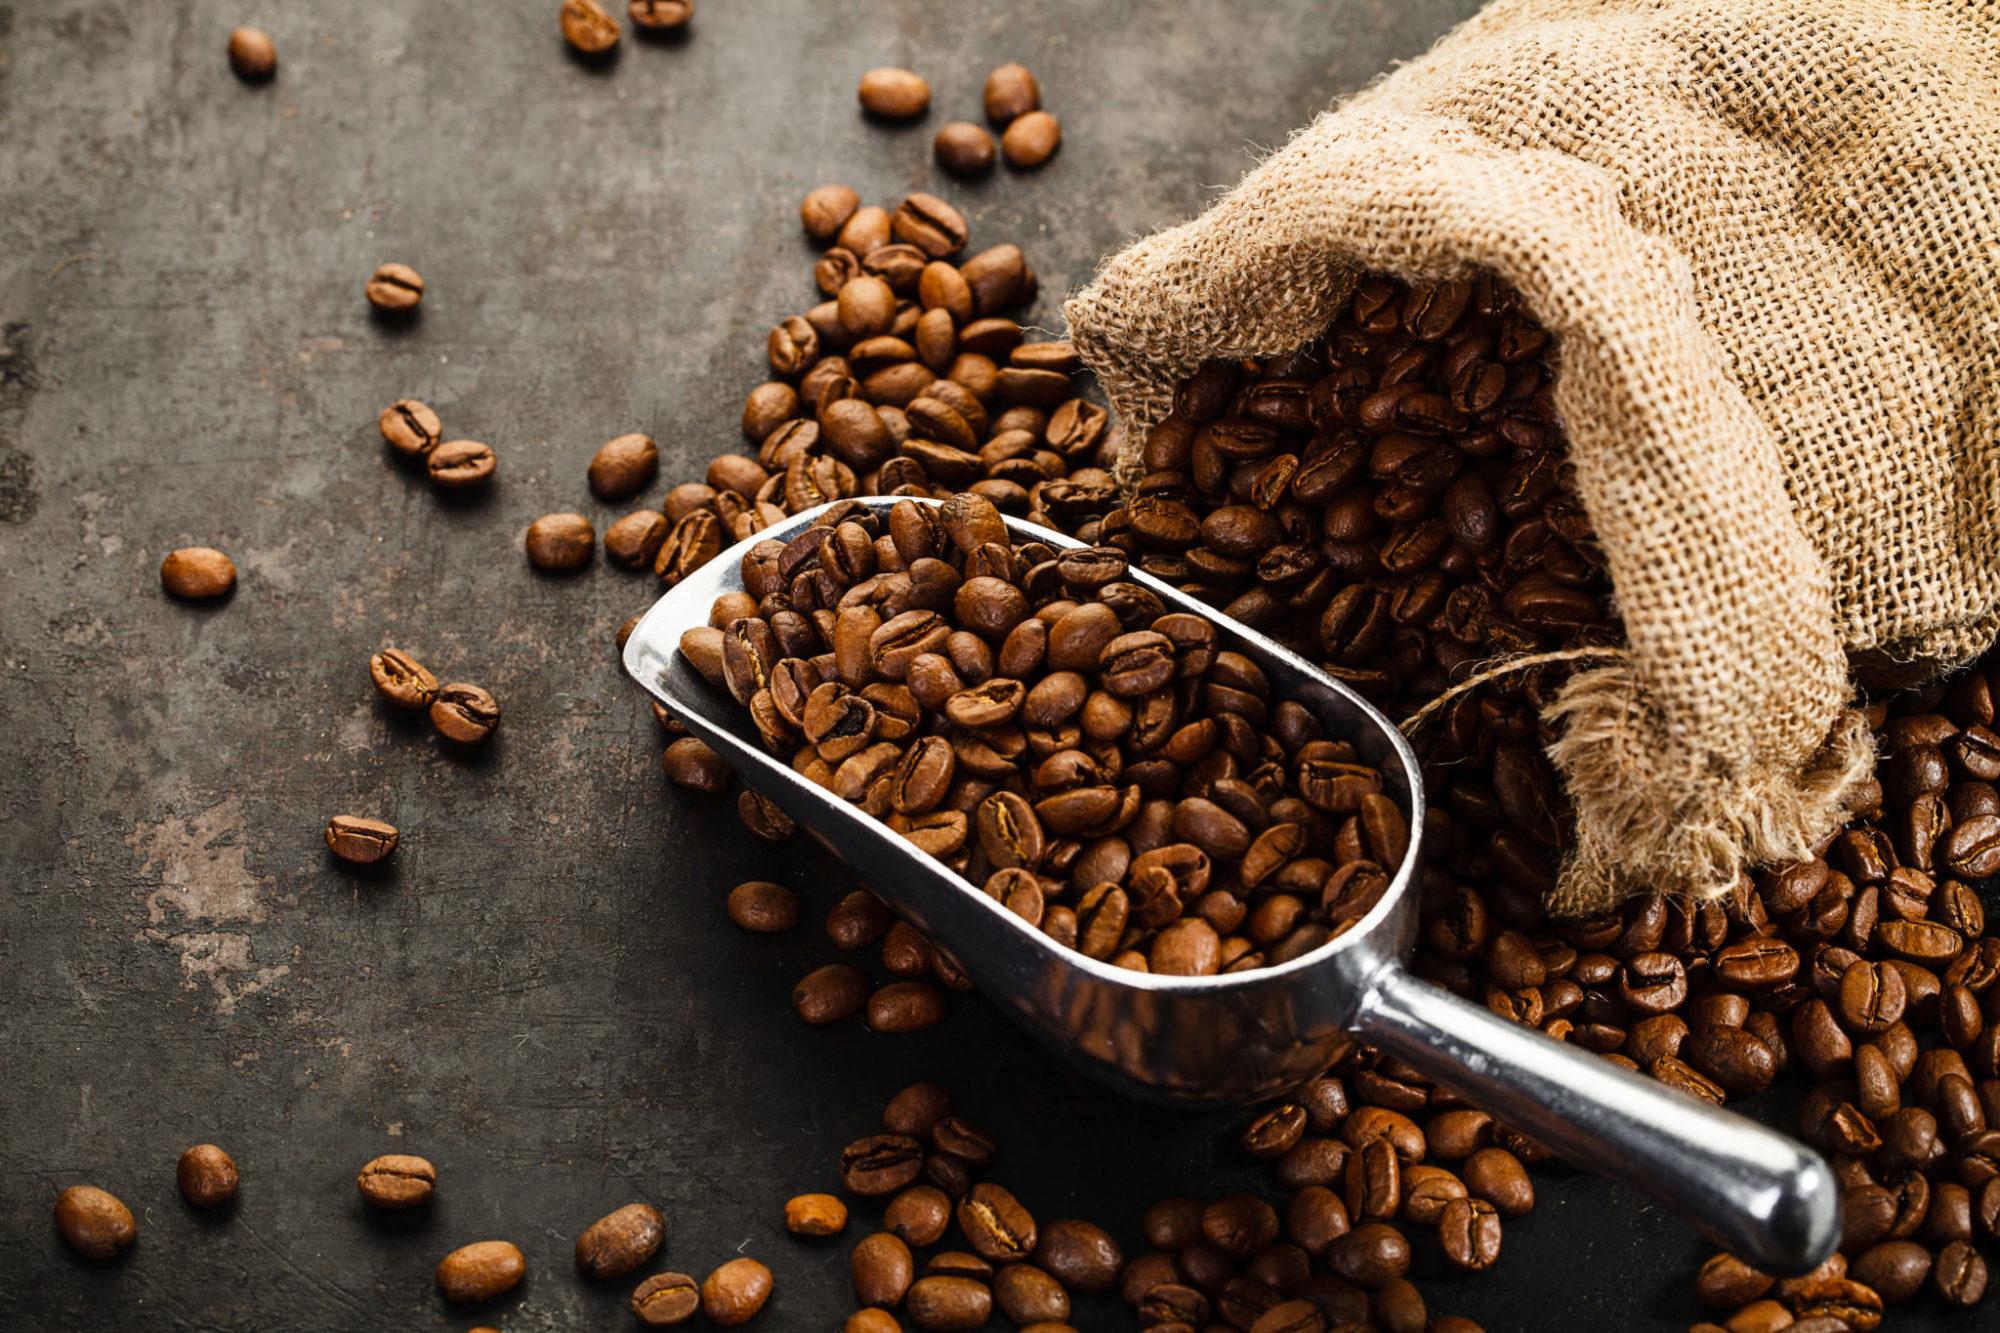 Coffee May Decrease Pain Sensitivity